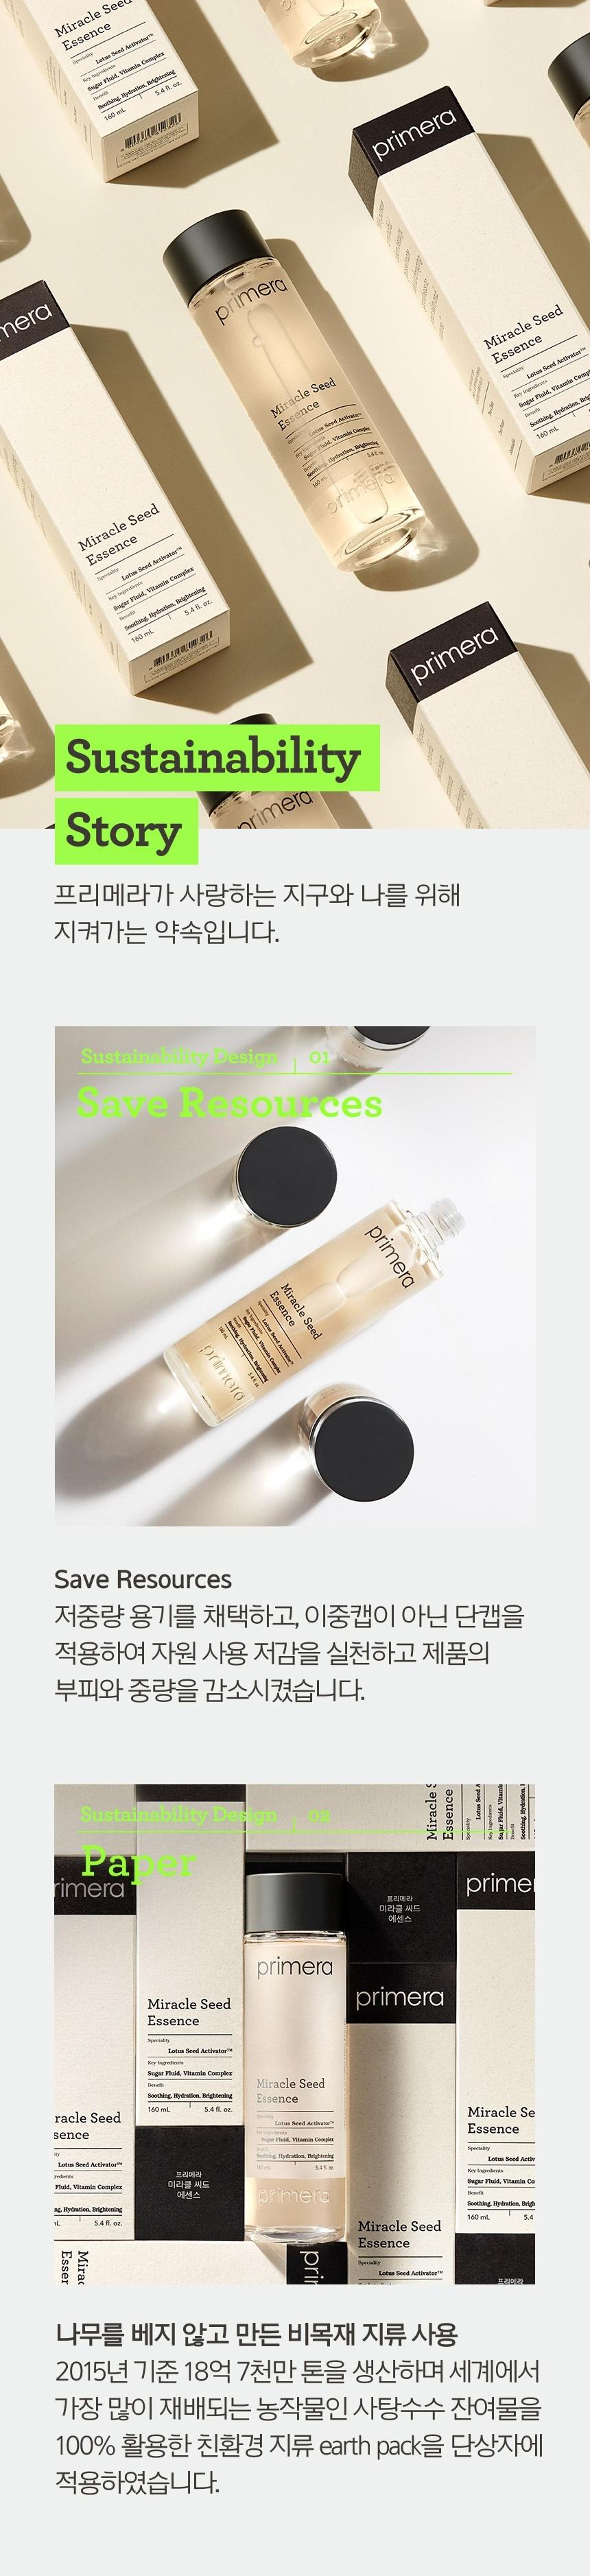 primera Miracle Seed Essence 230ml korean skincare prduct online shop malaysia sweden macau7